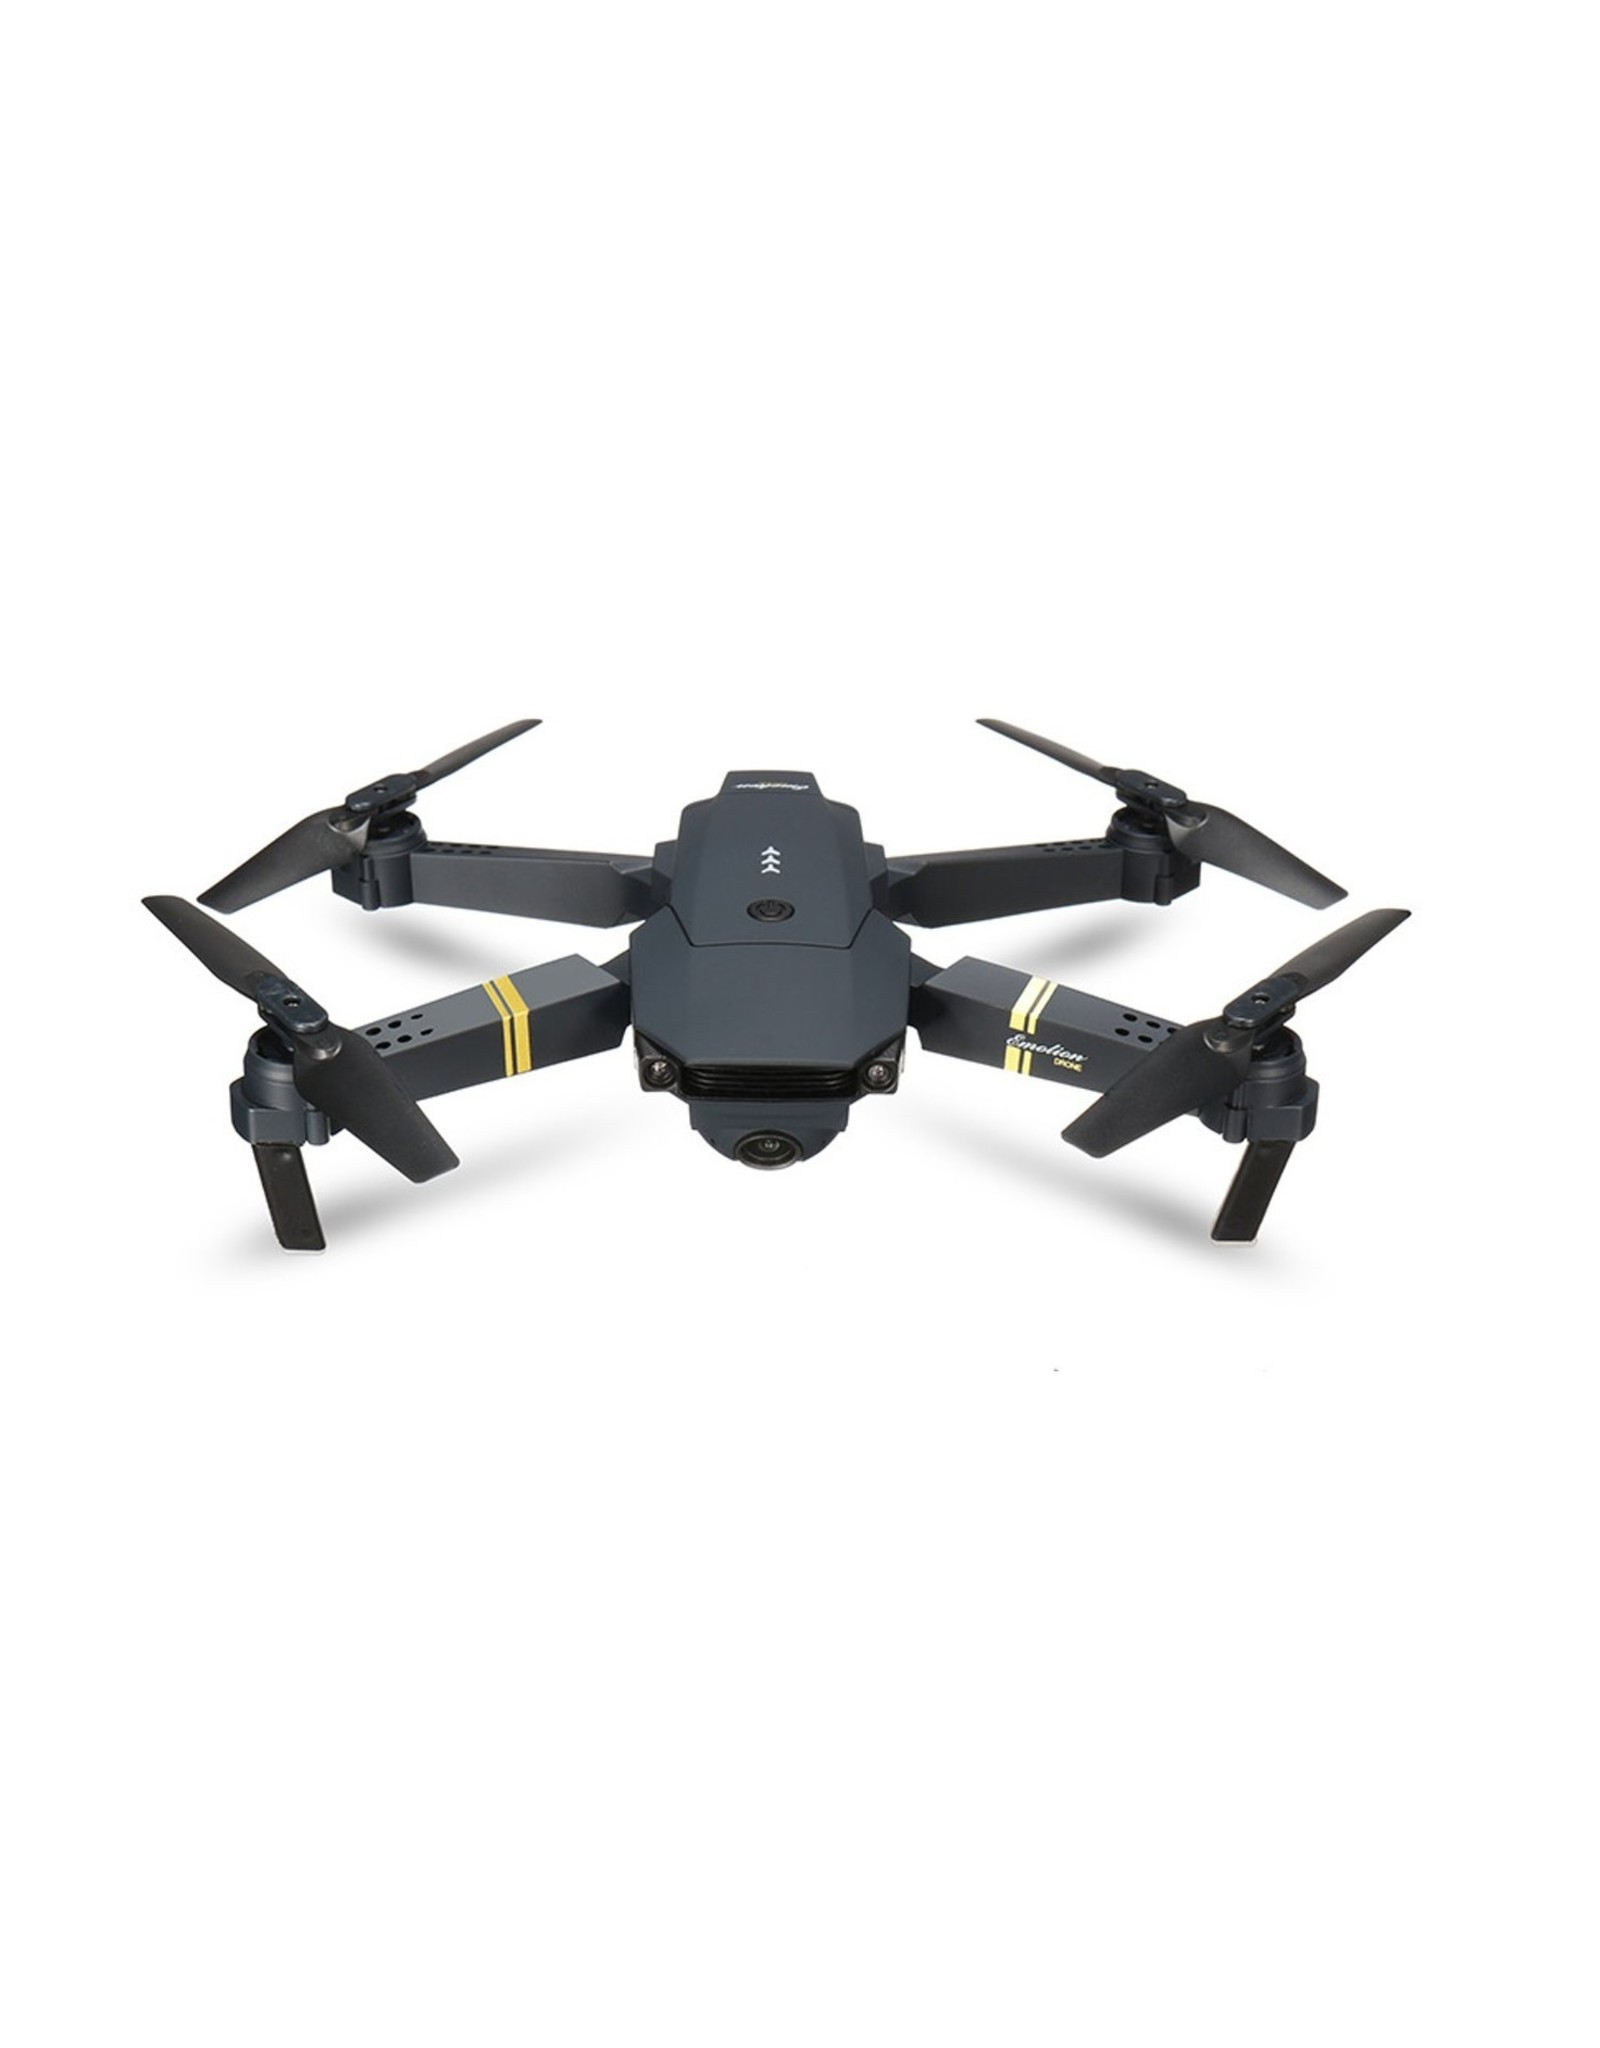 Wifi drone met camera - FPV Drone - Black